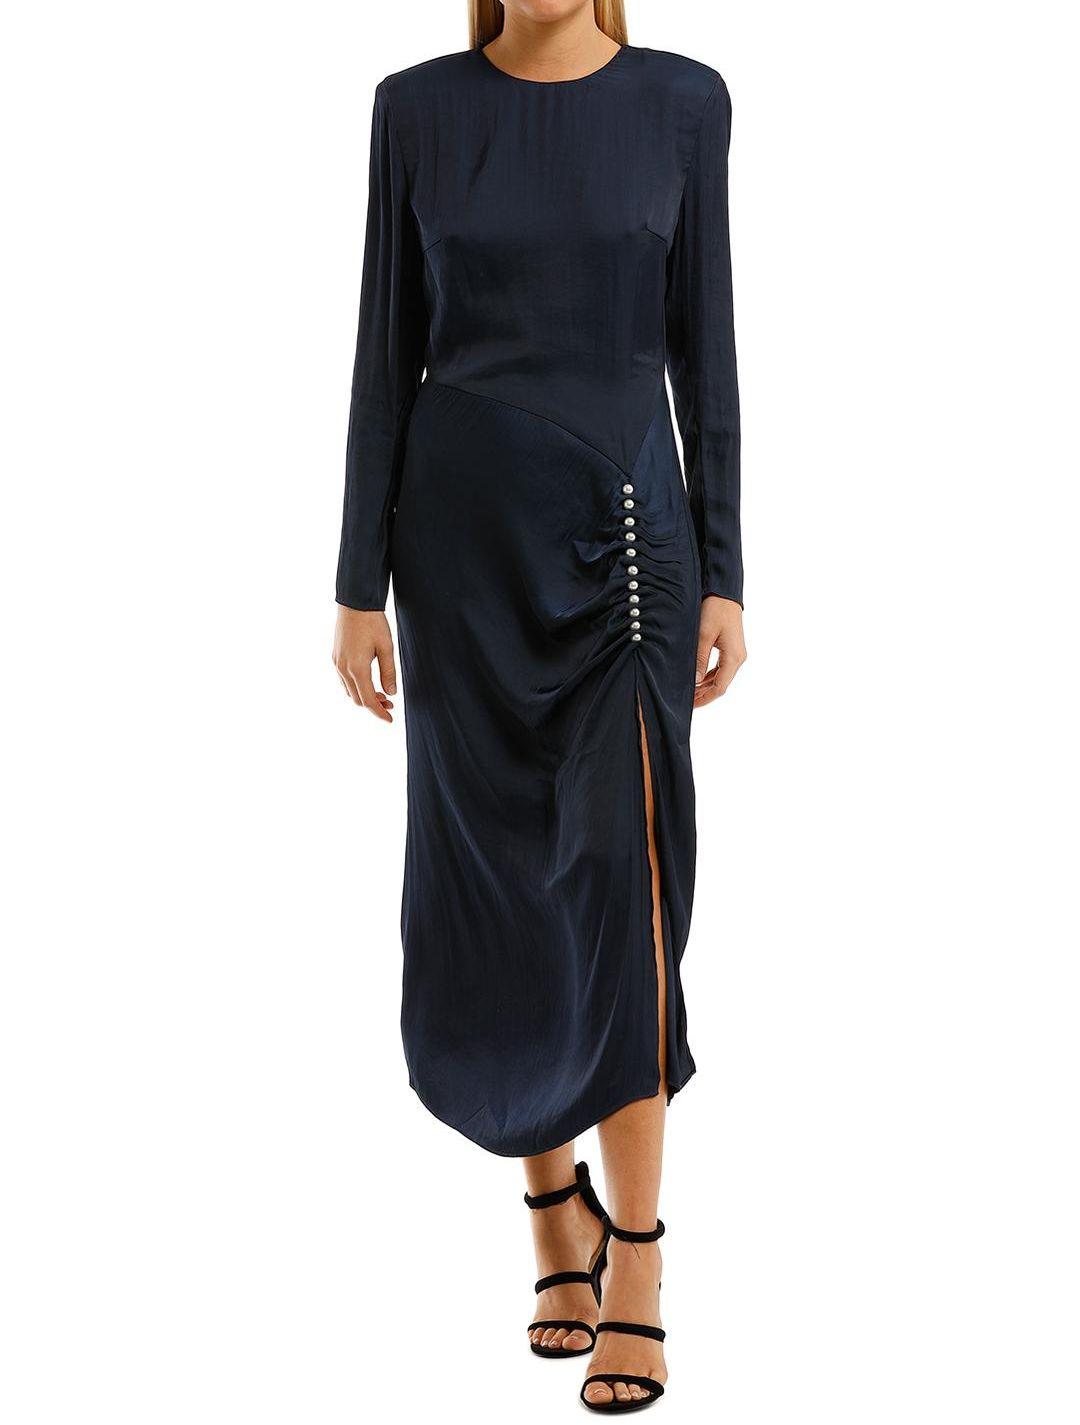 Elliatt Ministry Dress Navy Long Sleeve